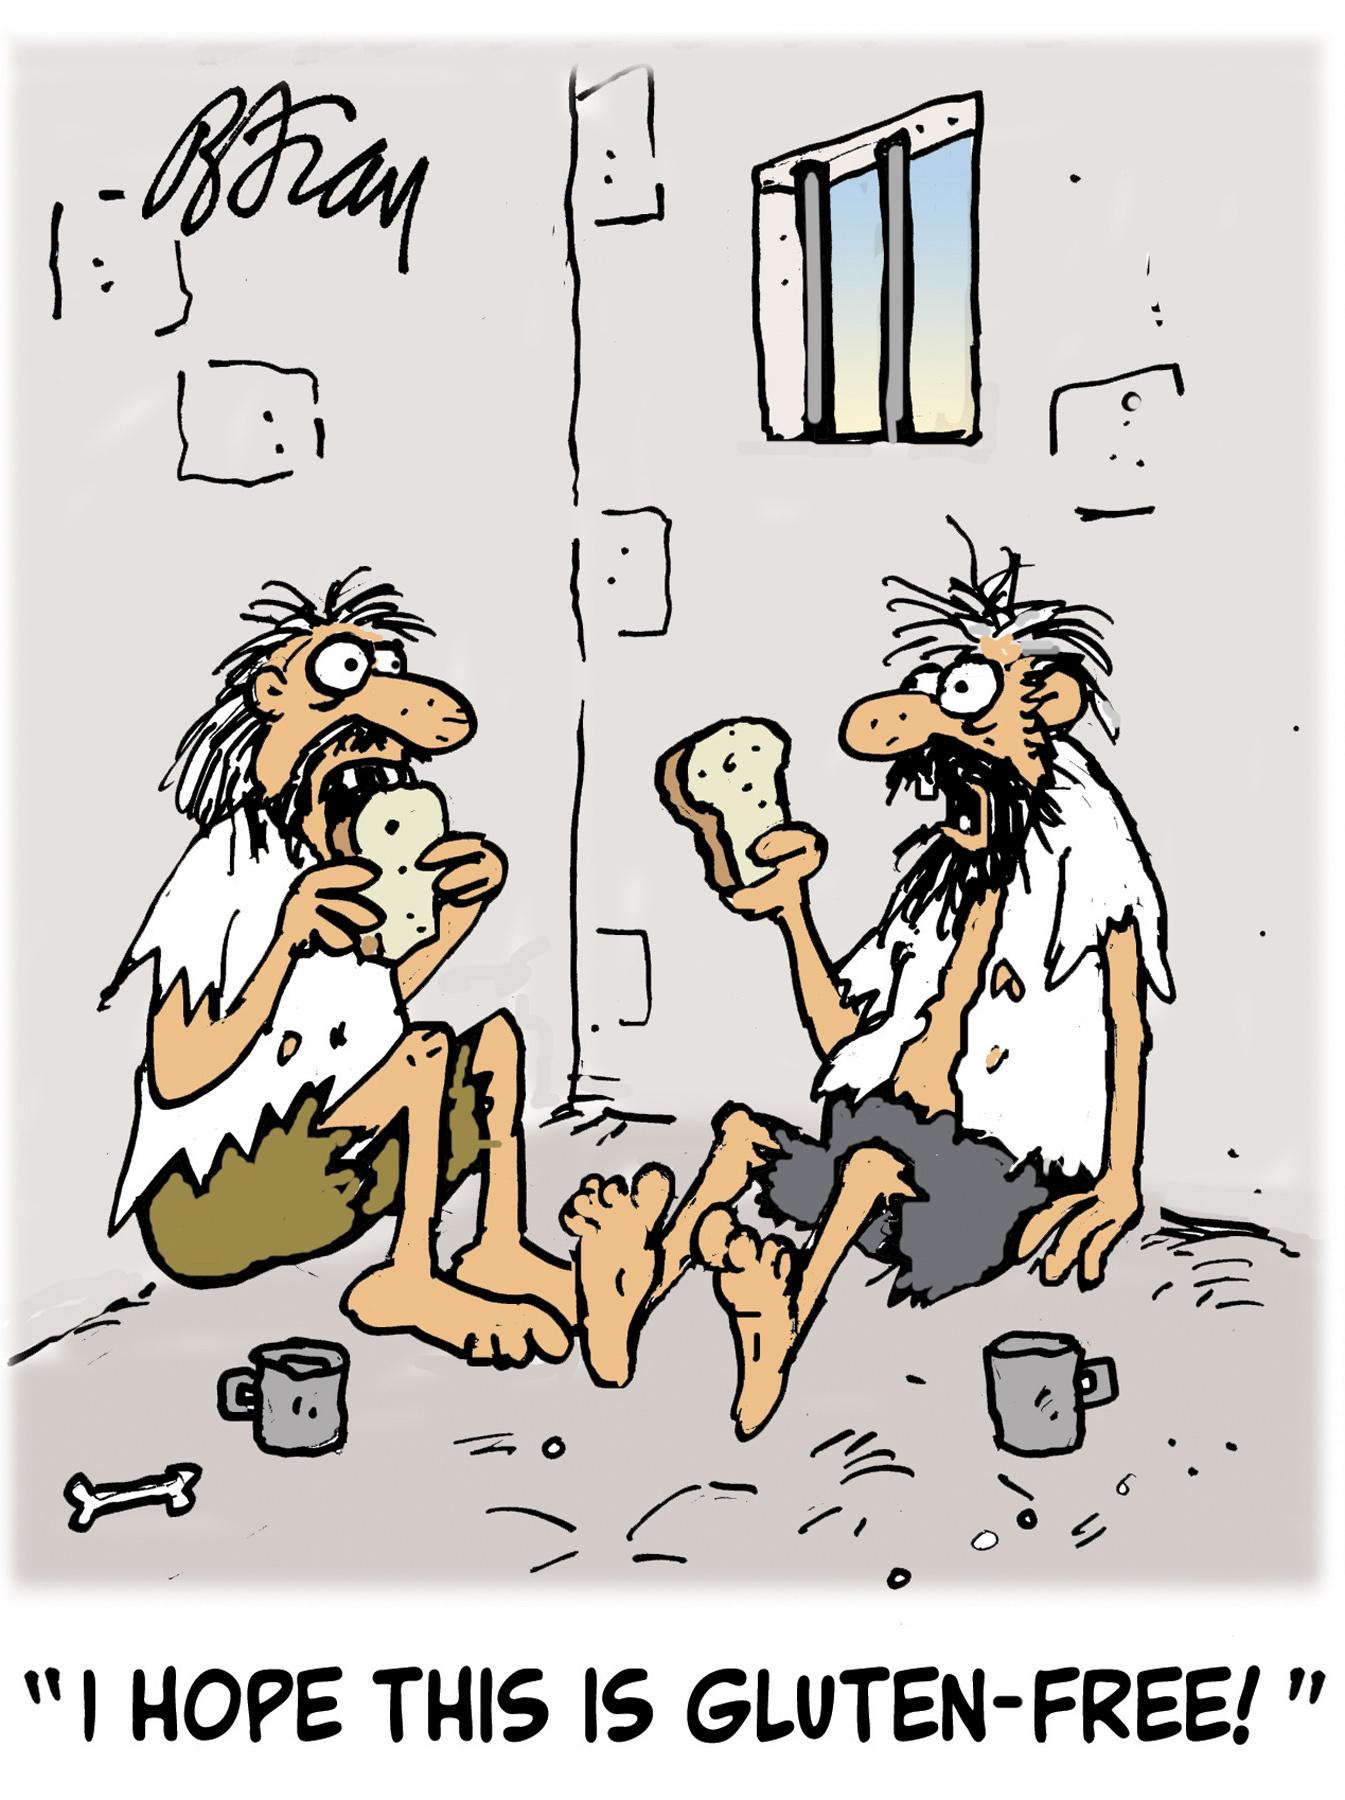 http://www.adventuresofaglutenfreemom.com/wp-content/uploads/2011/01/Gluten-Free-Cartoon.jpg